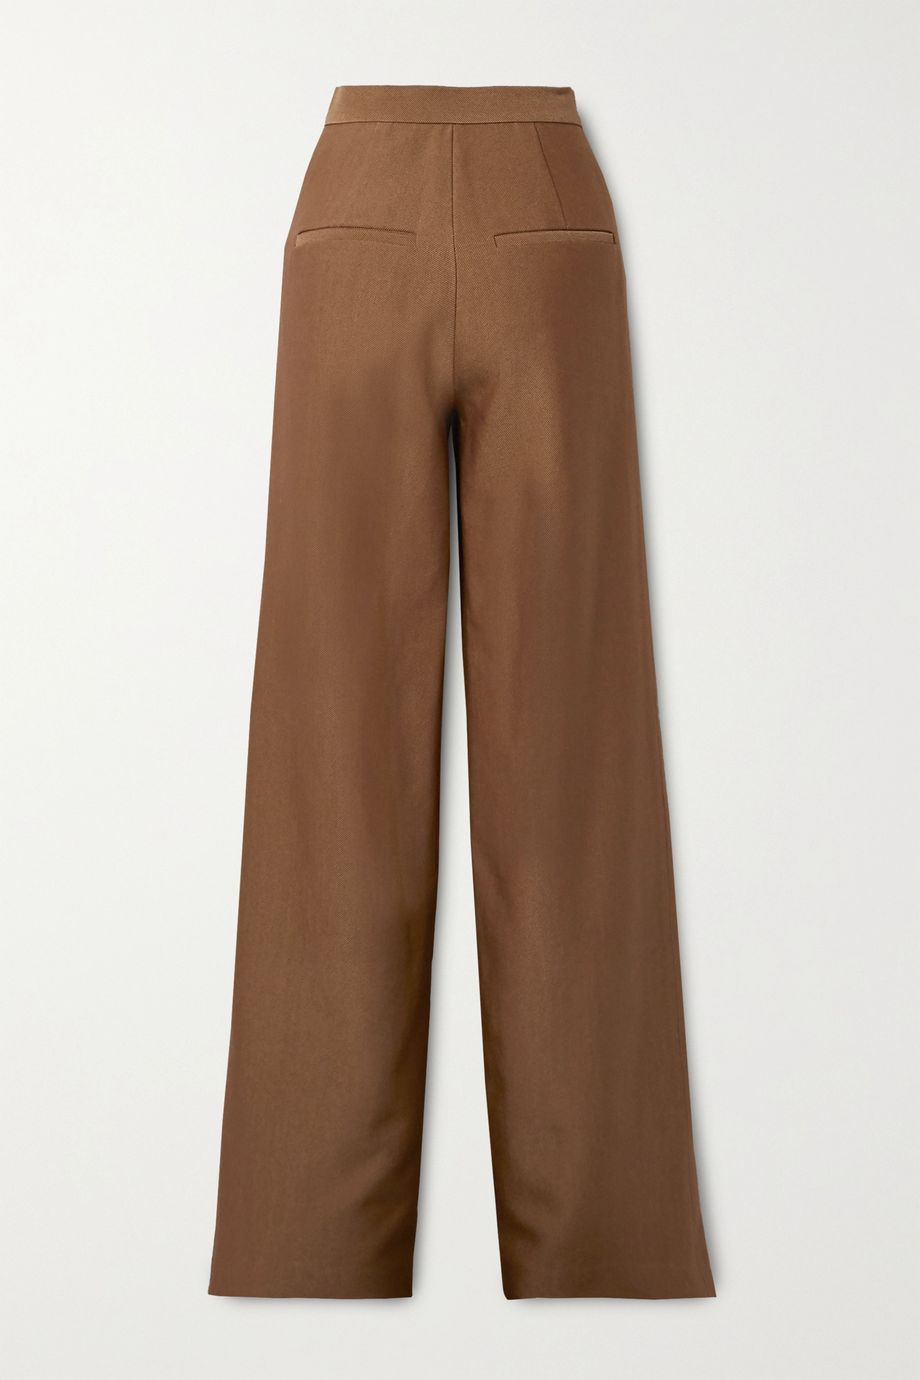 Brandon Maxwell Wool and silk-blend twill wide-leg pants